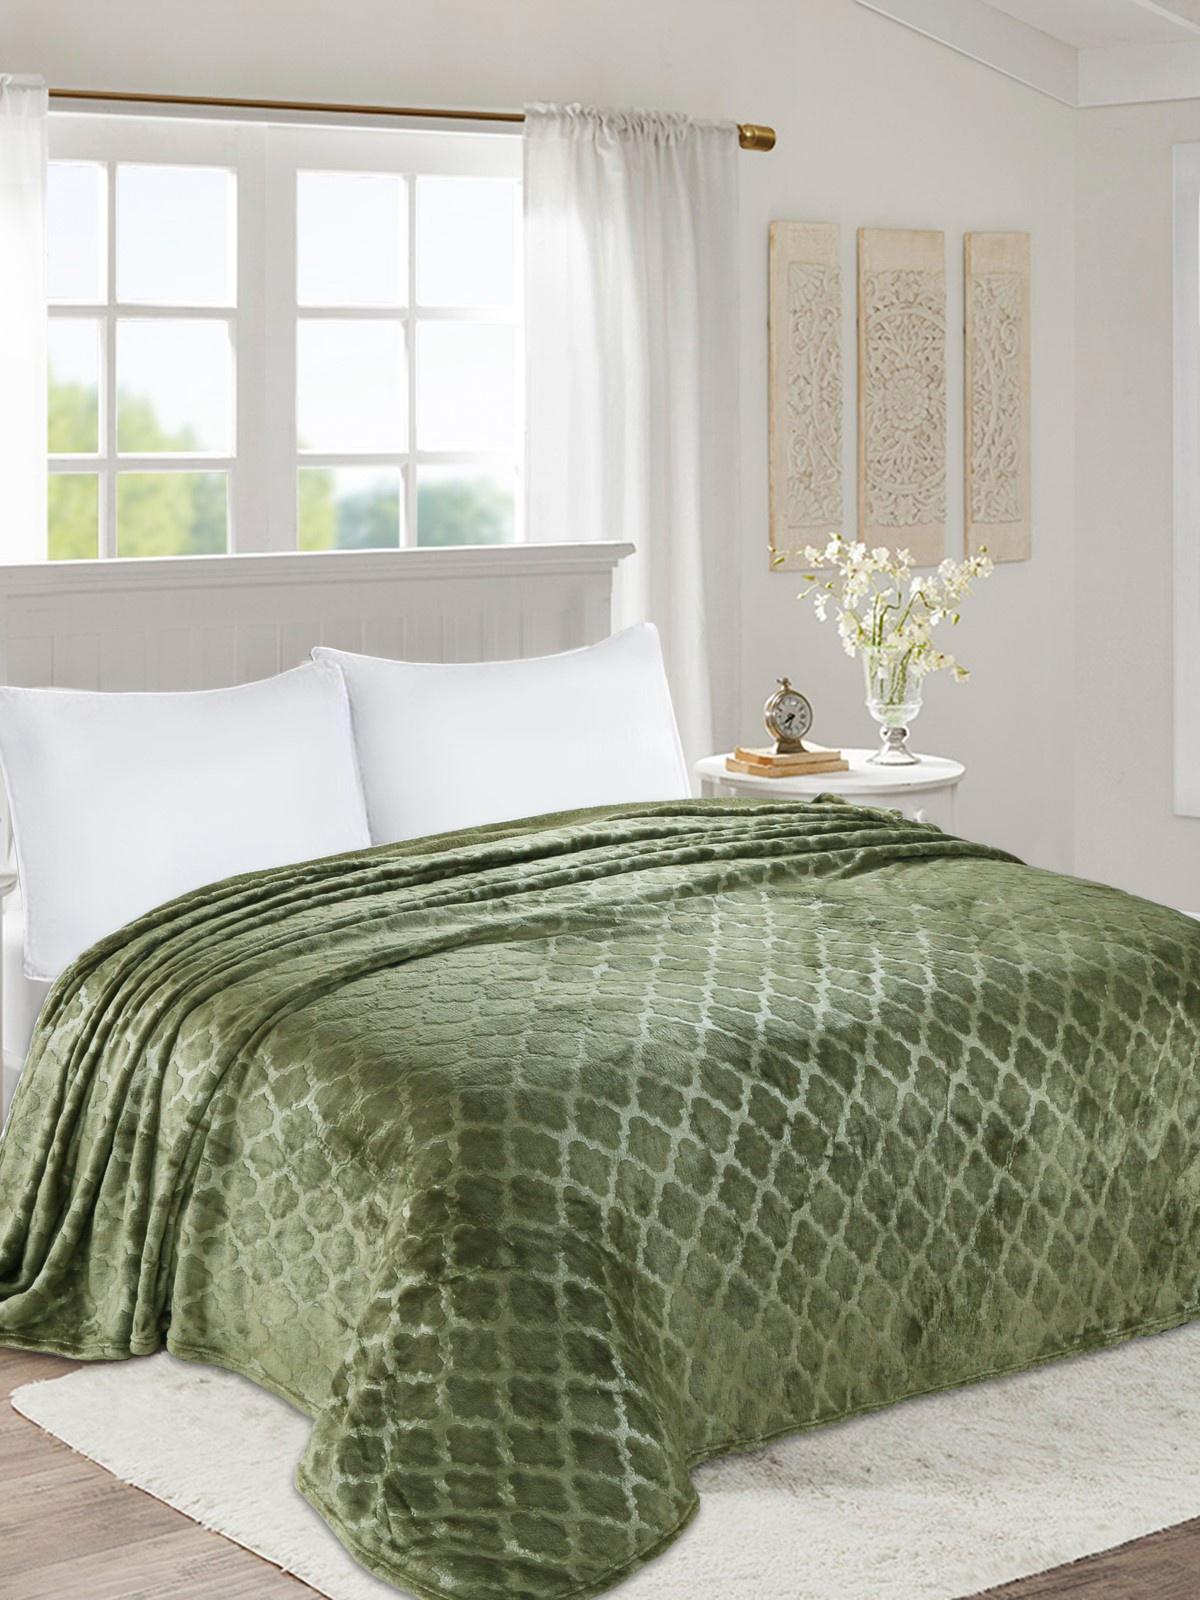 Плед world textile ВОРД-2,0сп003-0, зеленый цена